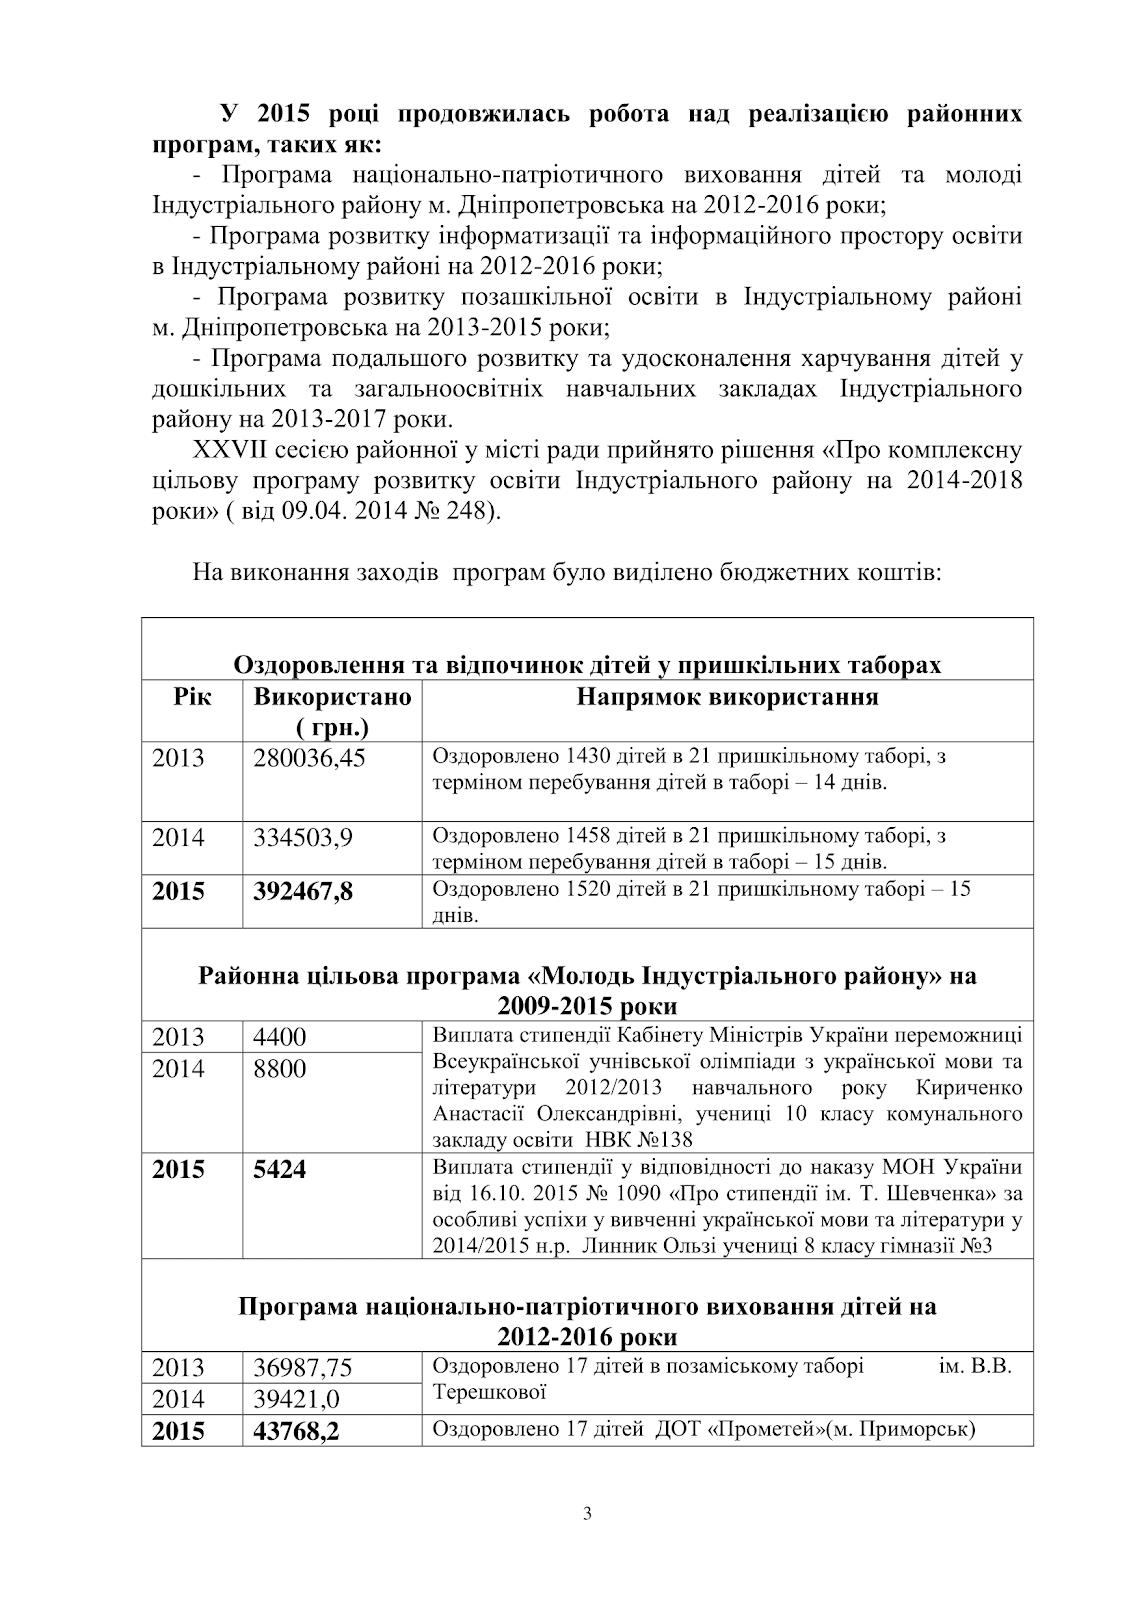 C:\Users\Валерия\Desktop\план 2016 рік\план 2016 рік-003.png